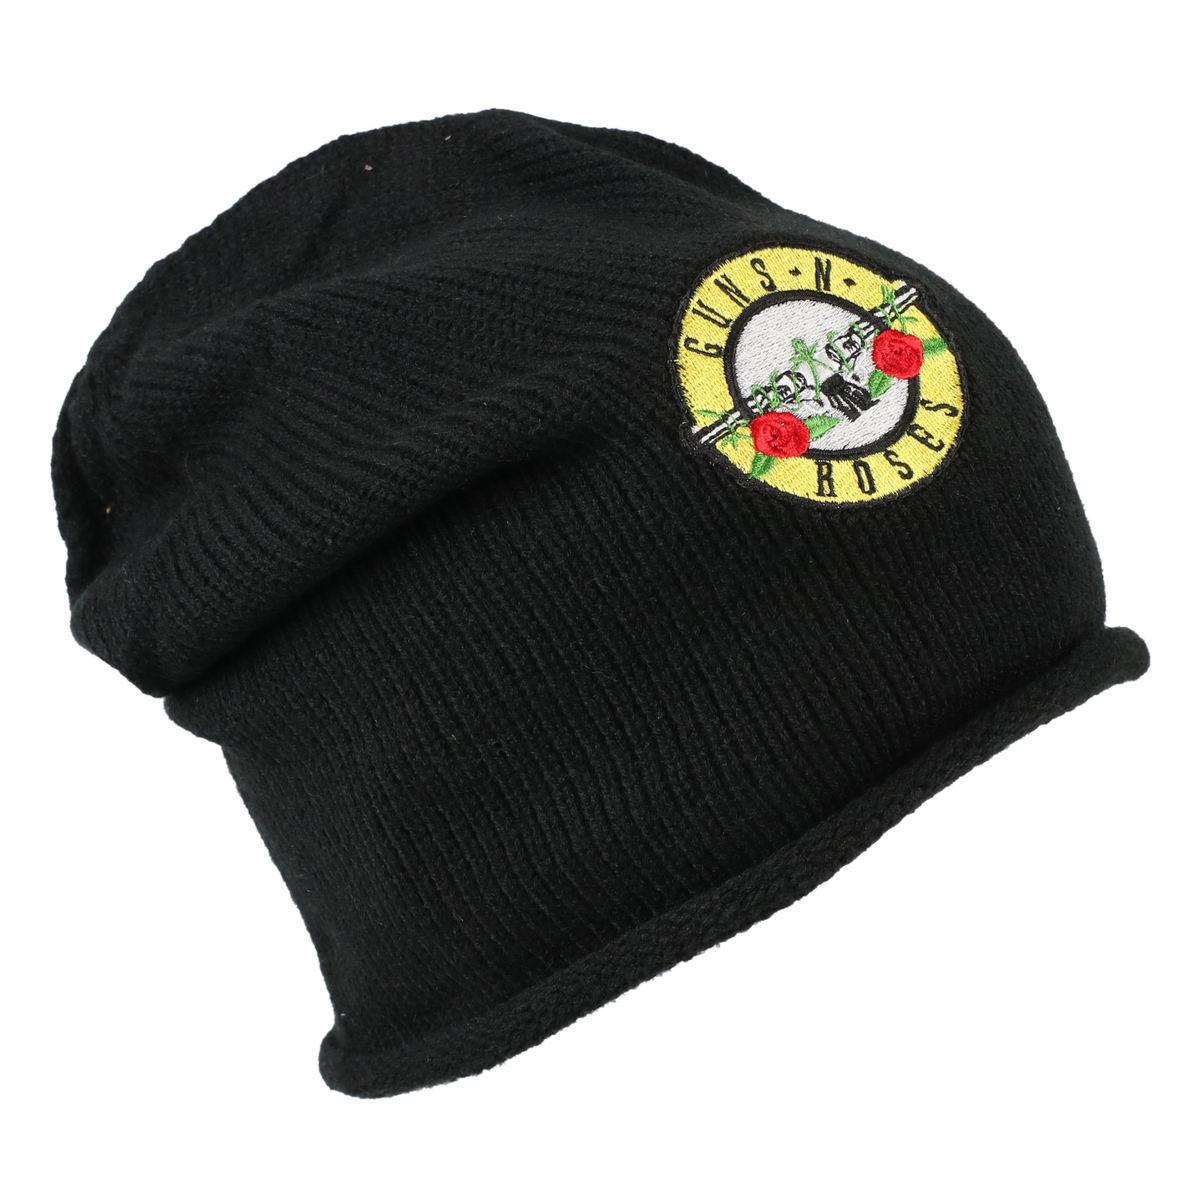 čiapka Guns N' Roses - BULLET SLOUCH - BRAVADO - 1216130H00